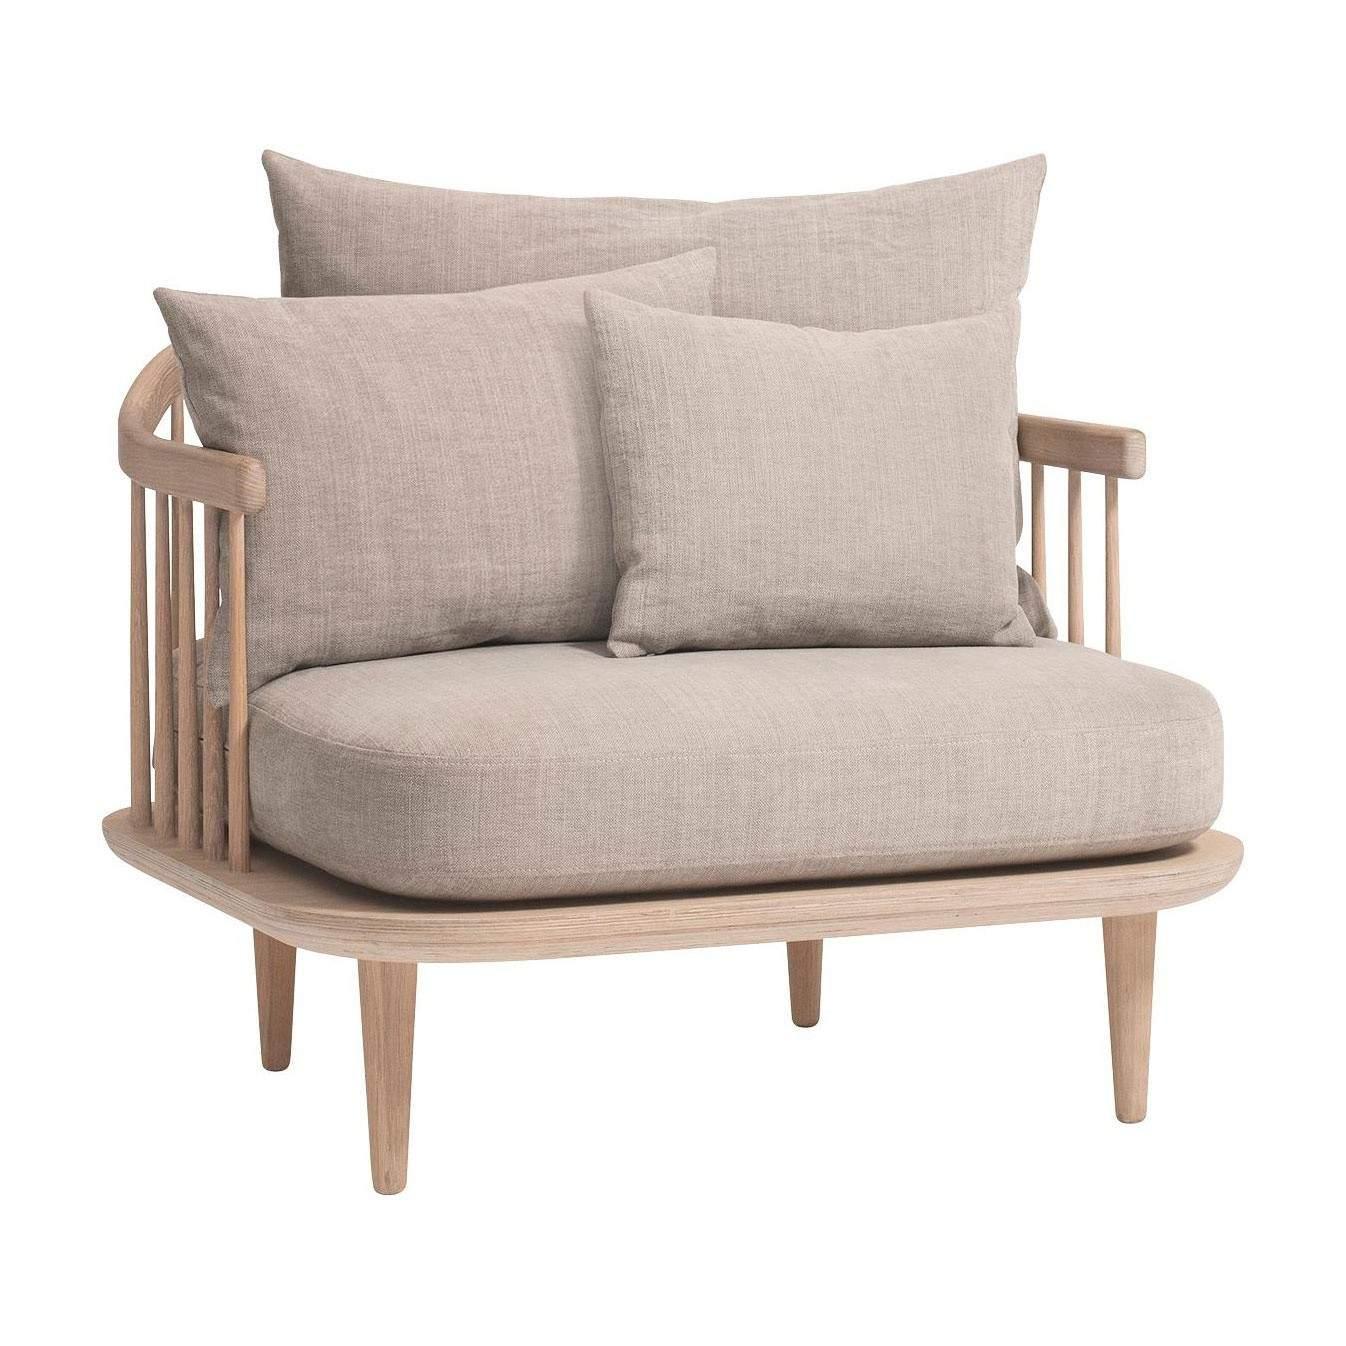 AndTradition FLY Chair SC1 Sessel 1346x1346 ID d4e26e2db790eba16b5380a04f4b2028